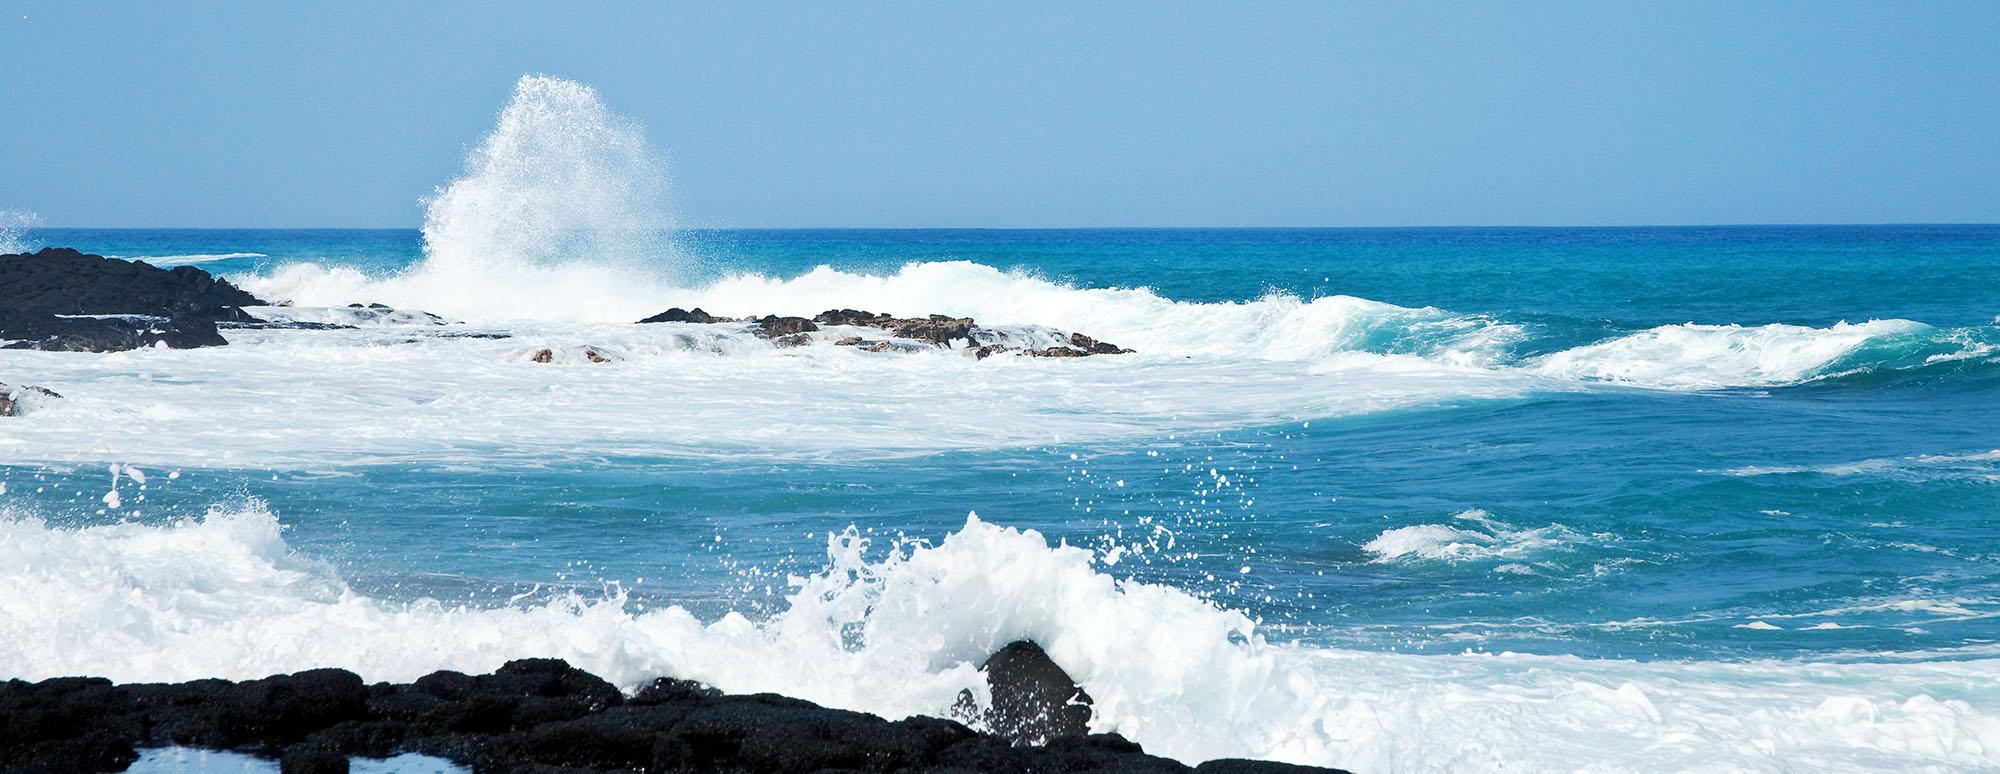 COASTAL BEACH OCEAN_090627_MG_9863_sm2000_FLIP.jpg